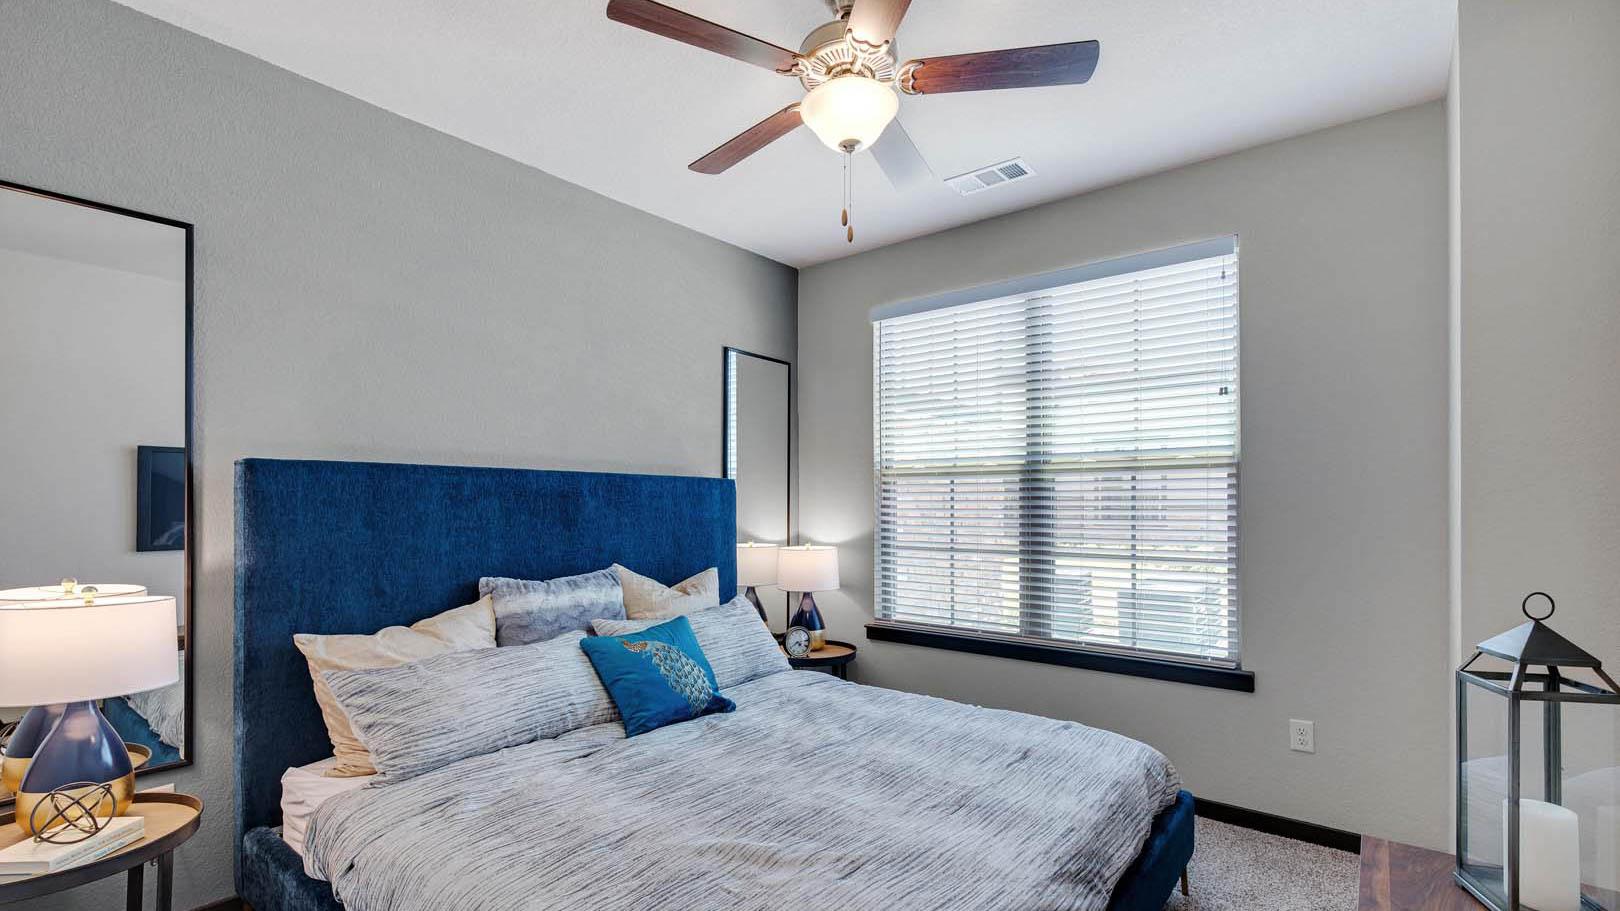 Bedroom 2 at Springs in Round Rock in Austin Texas